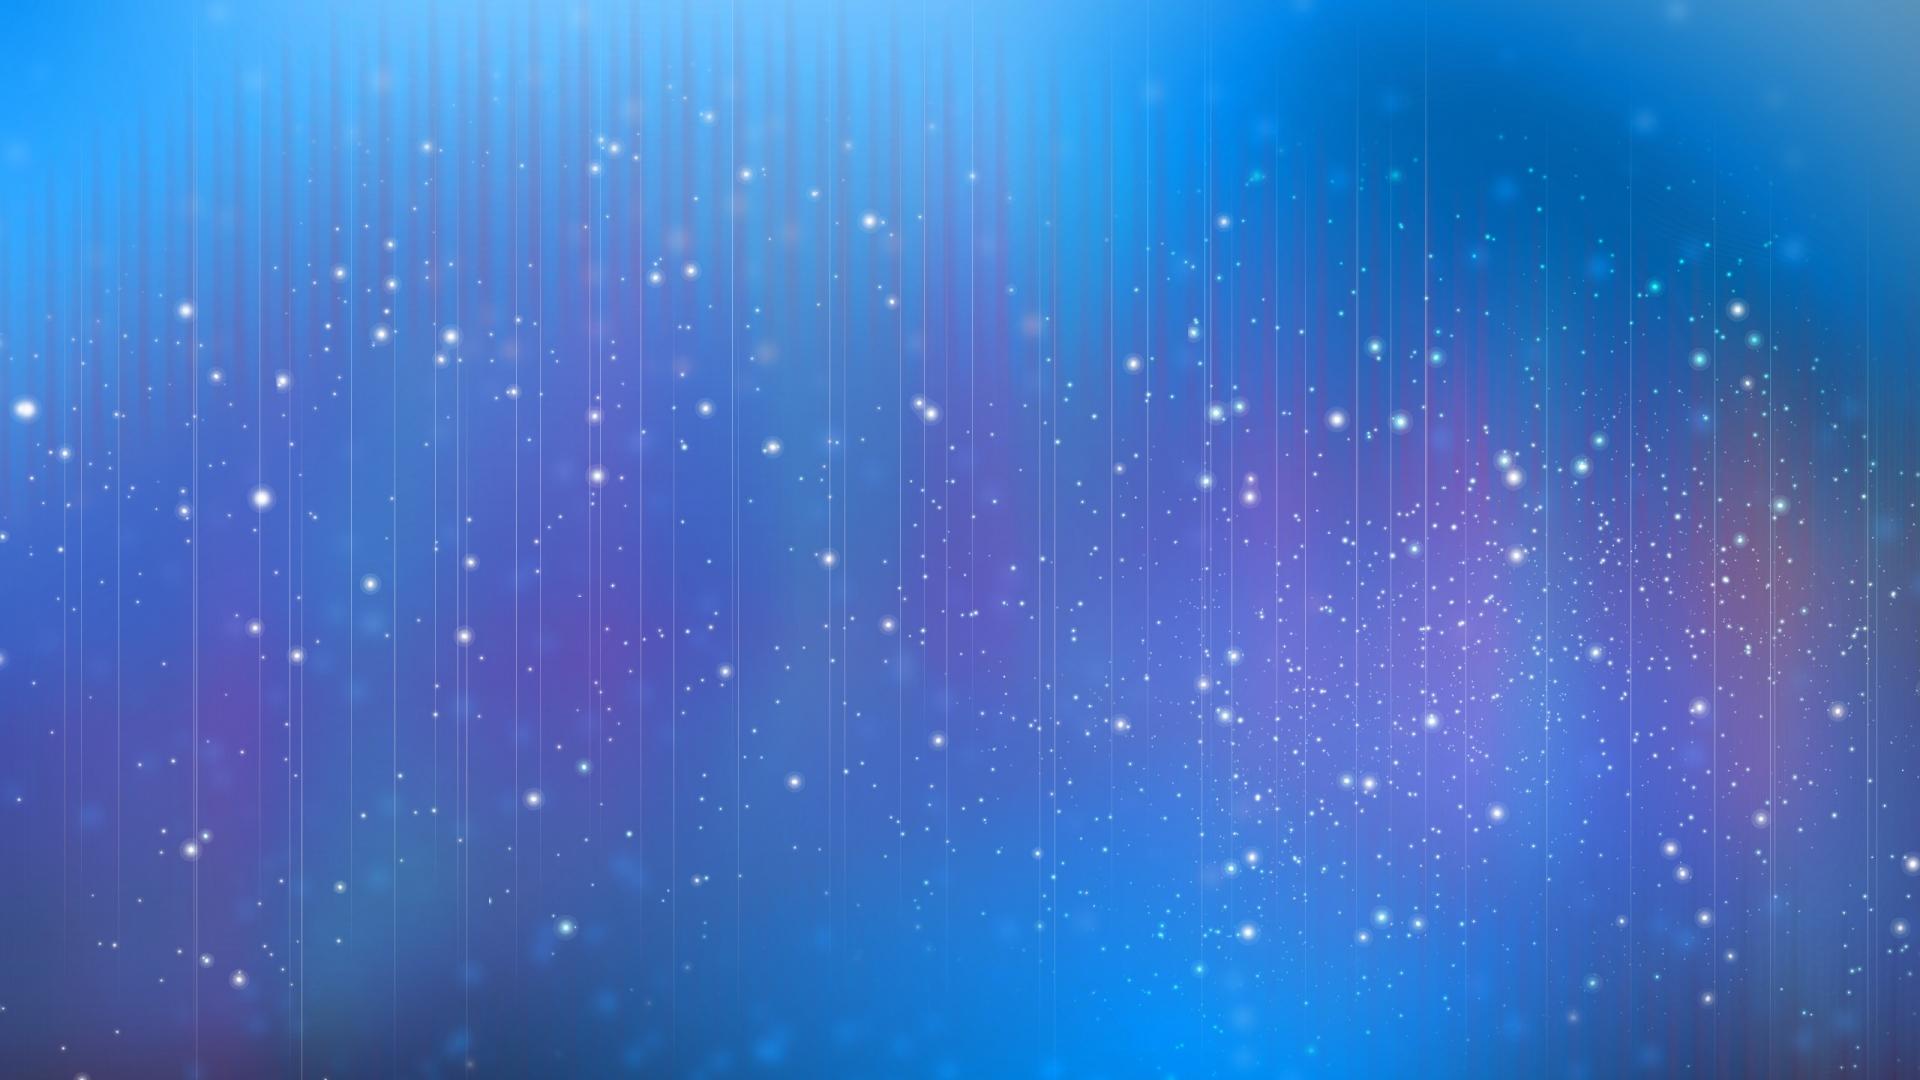 Stardust Wallpaper wallpaper - 964302